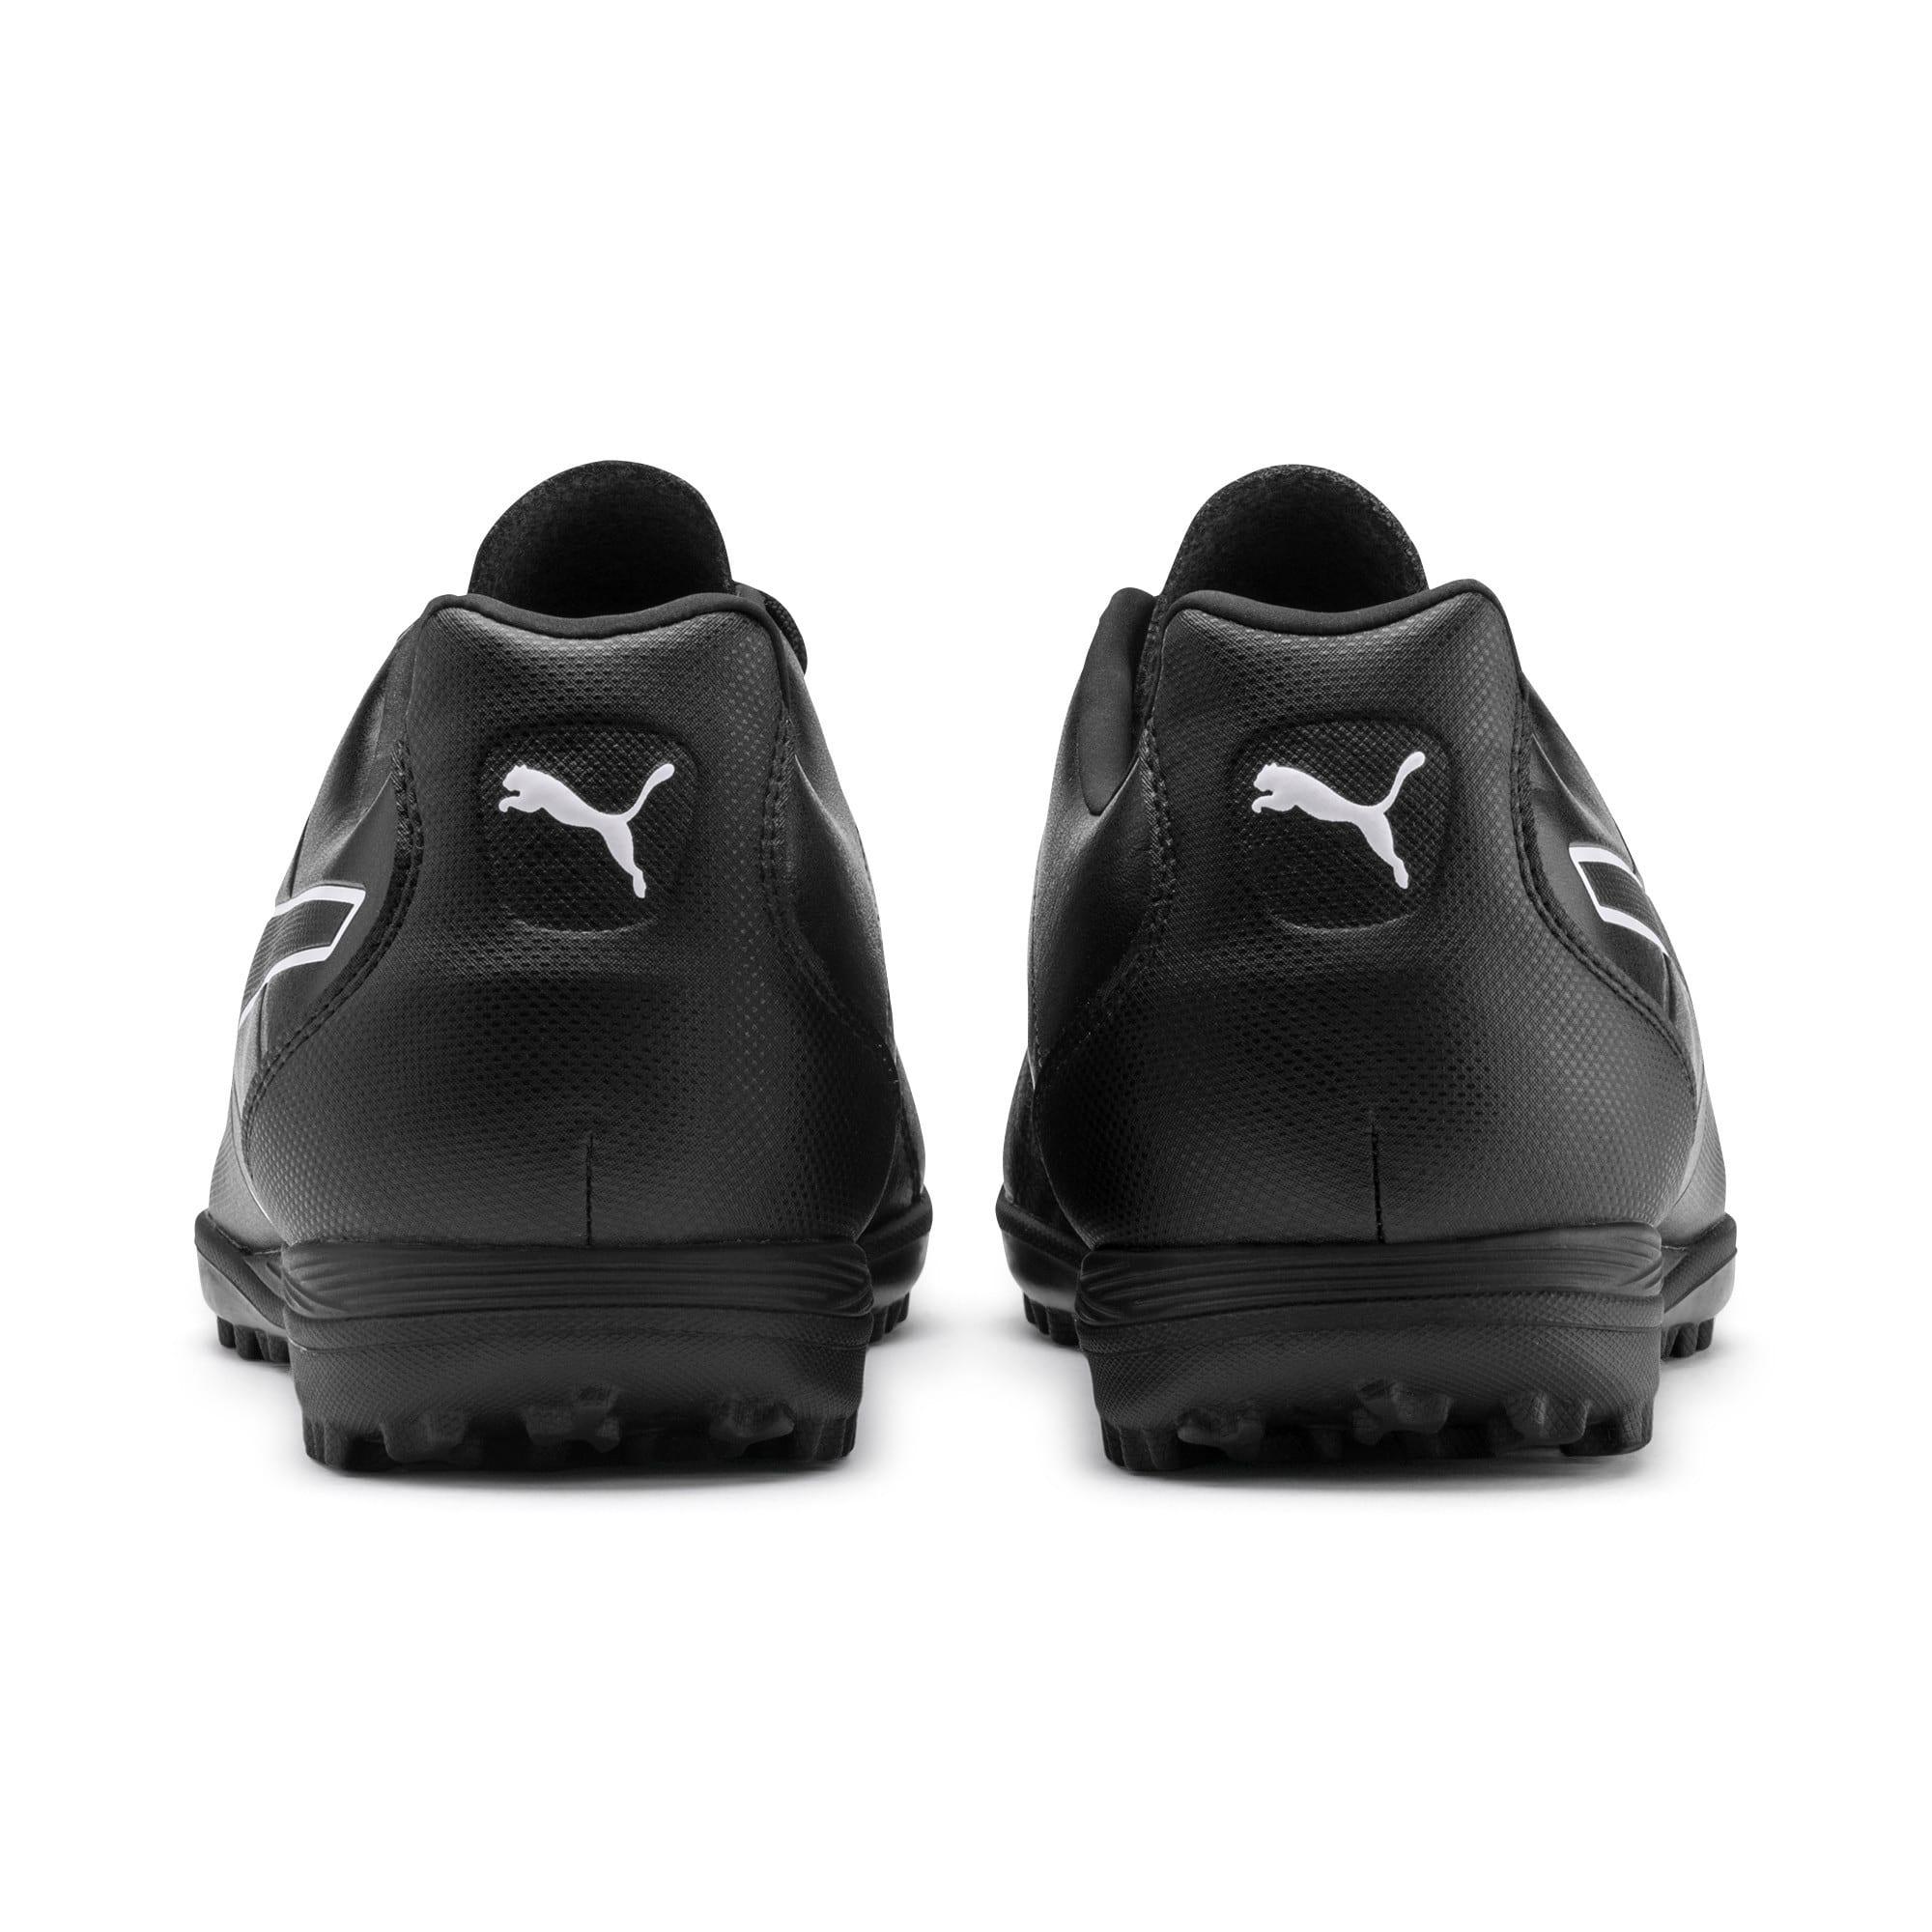 Thumbnail 4 of KING Hero TT Football Boots, Puma Black-Puma White, medium